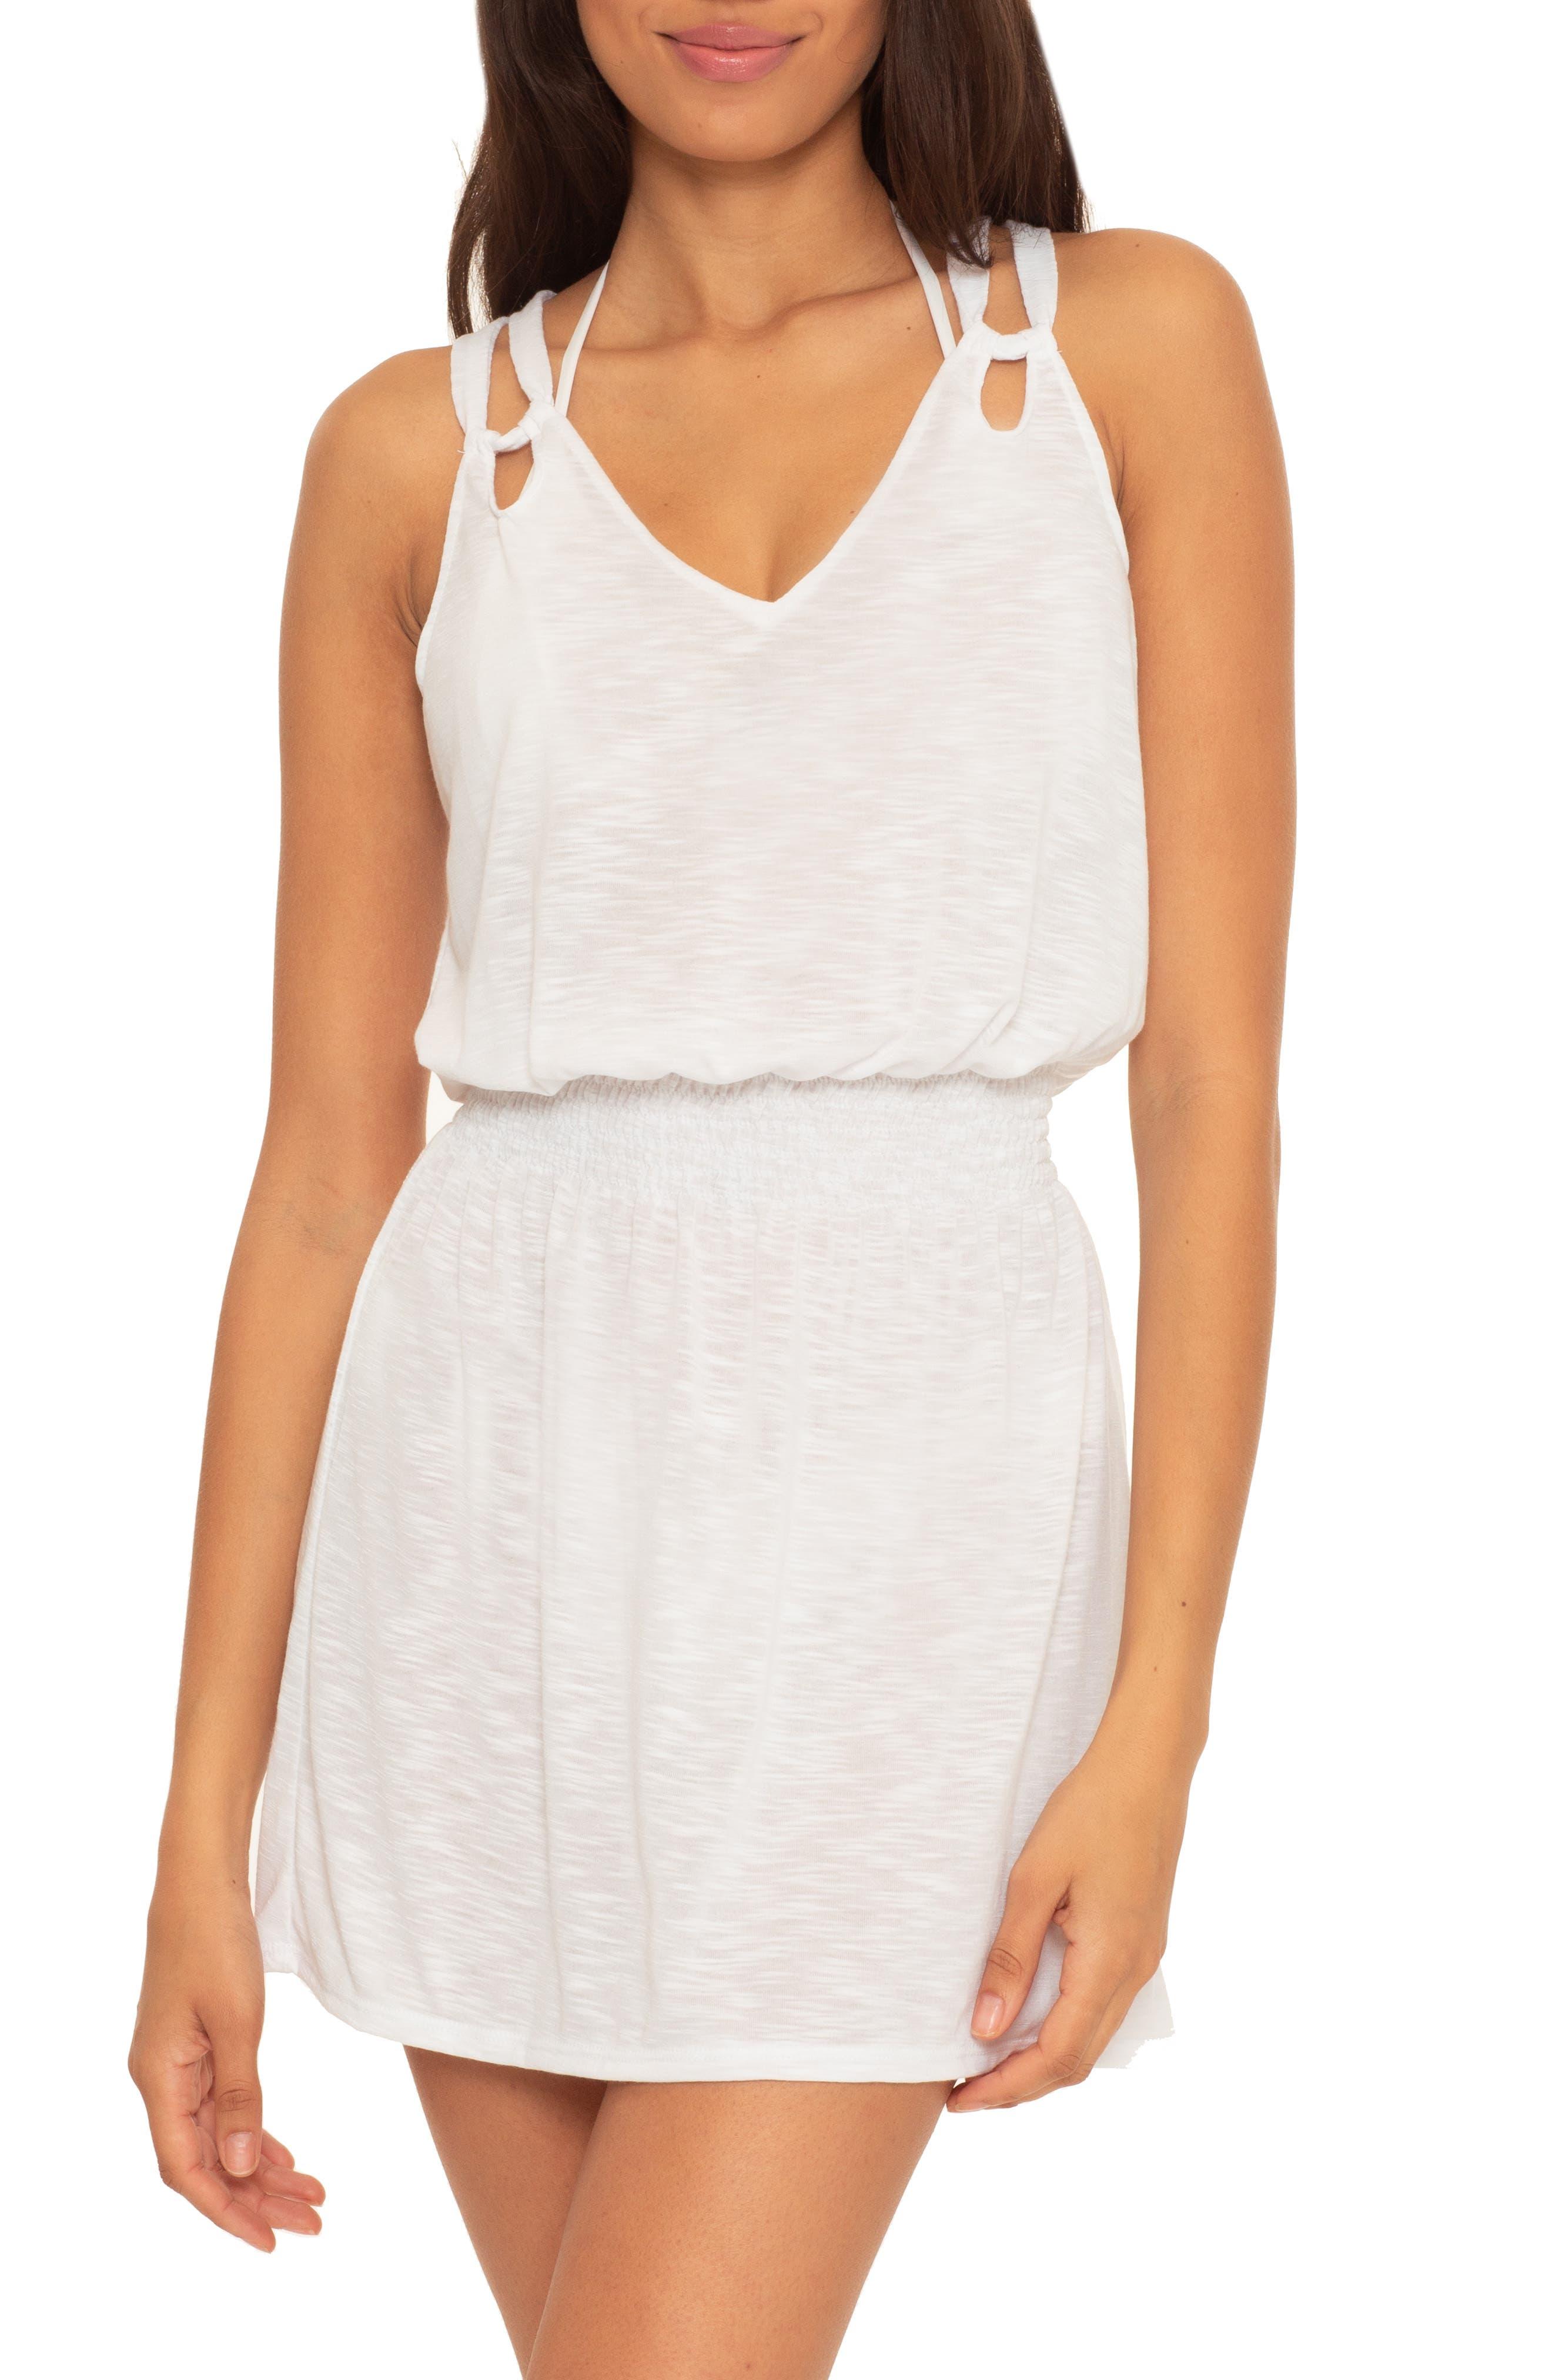 Breezy Basics Slub Jersey Cover-Up Dress